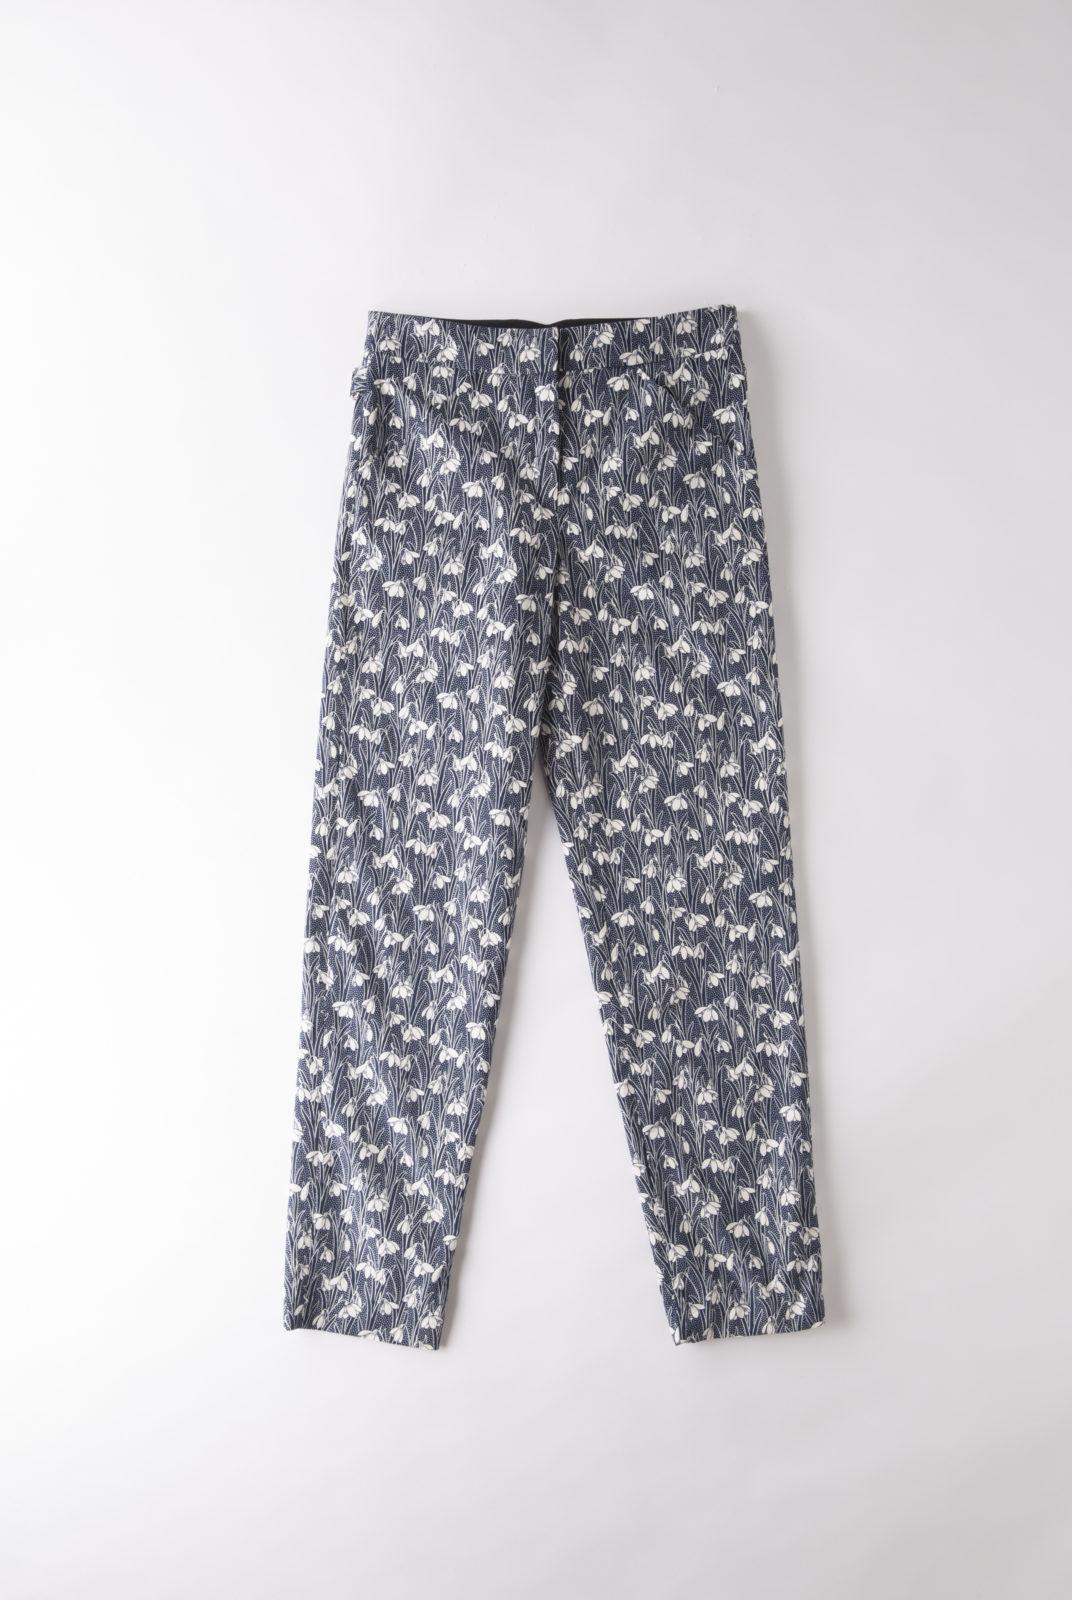 pantalon arazzo charles bleu marine en coton léger imprimé Liberty, roseanna